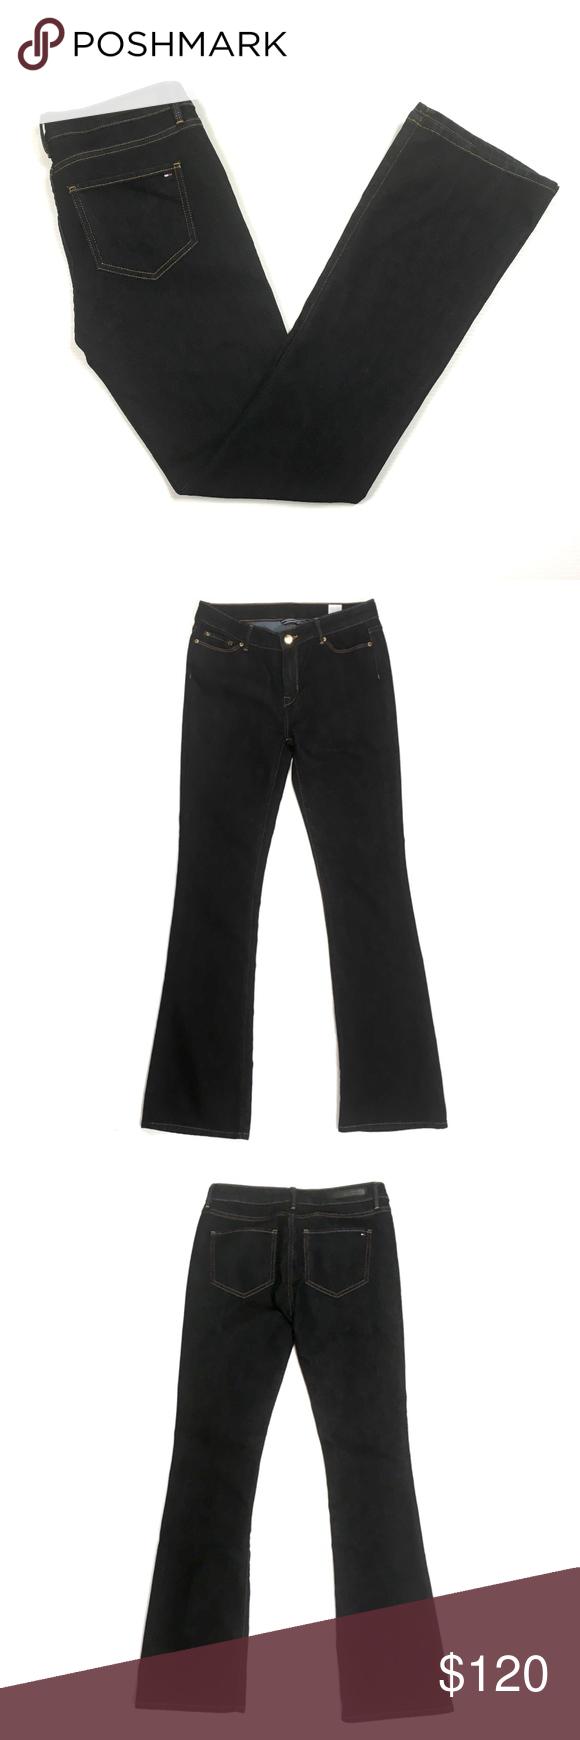 38a0a6829 Tommy Hilfiger Skinny Bootcut Vegas jeans dark Tommy Hilfiger Skinny  Bootcut Vegas jeans dark wash.